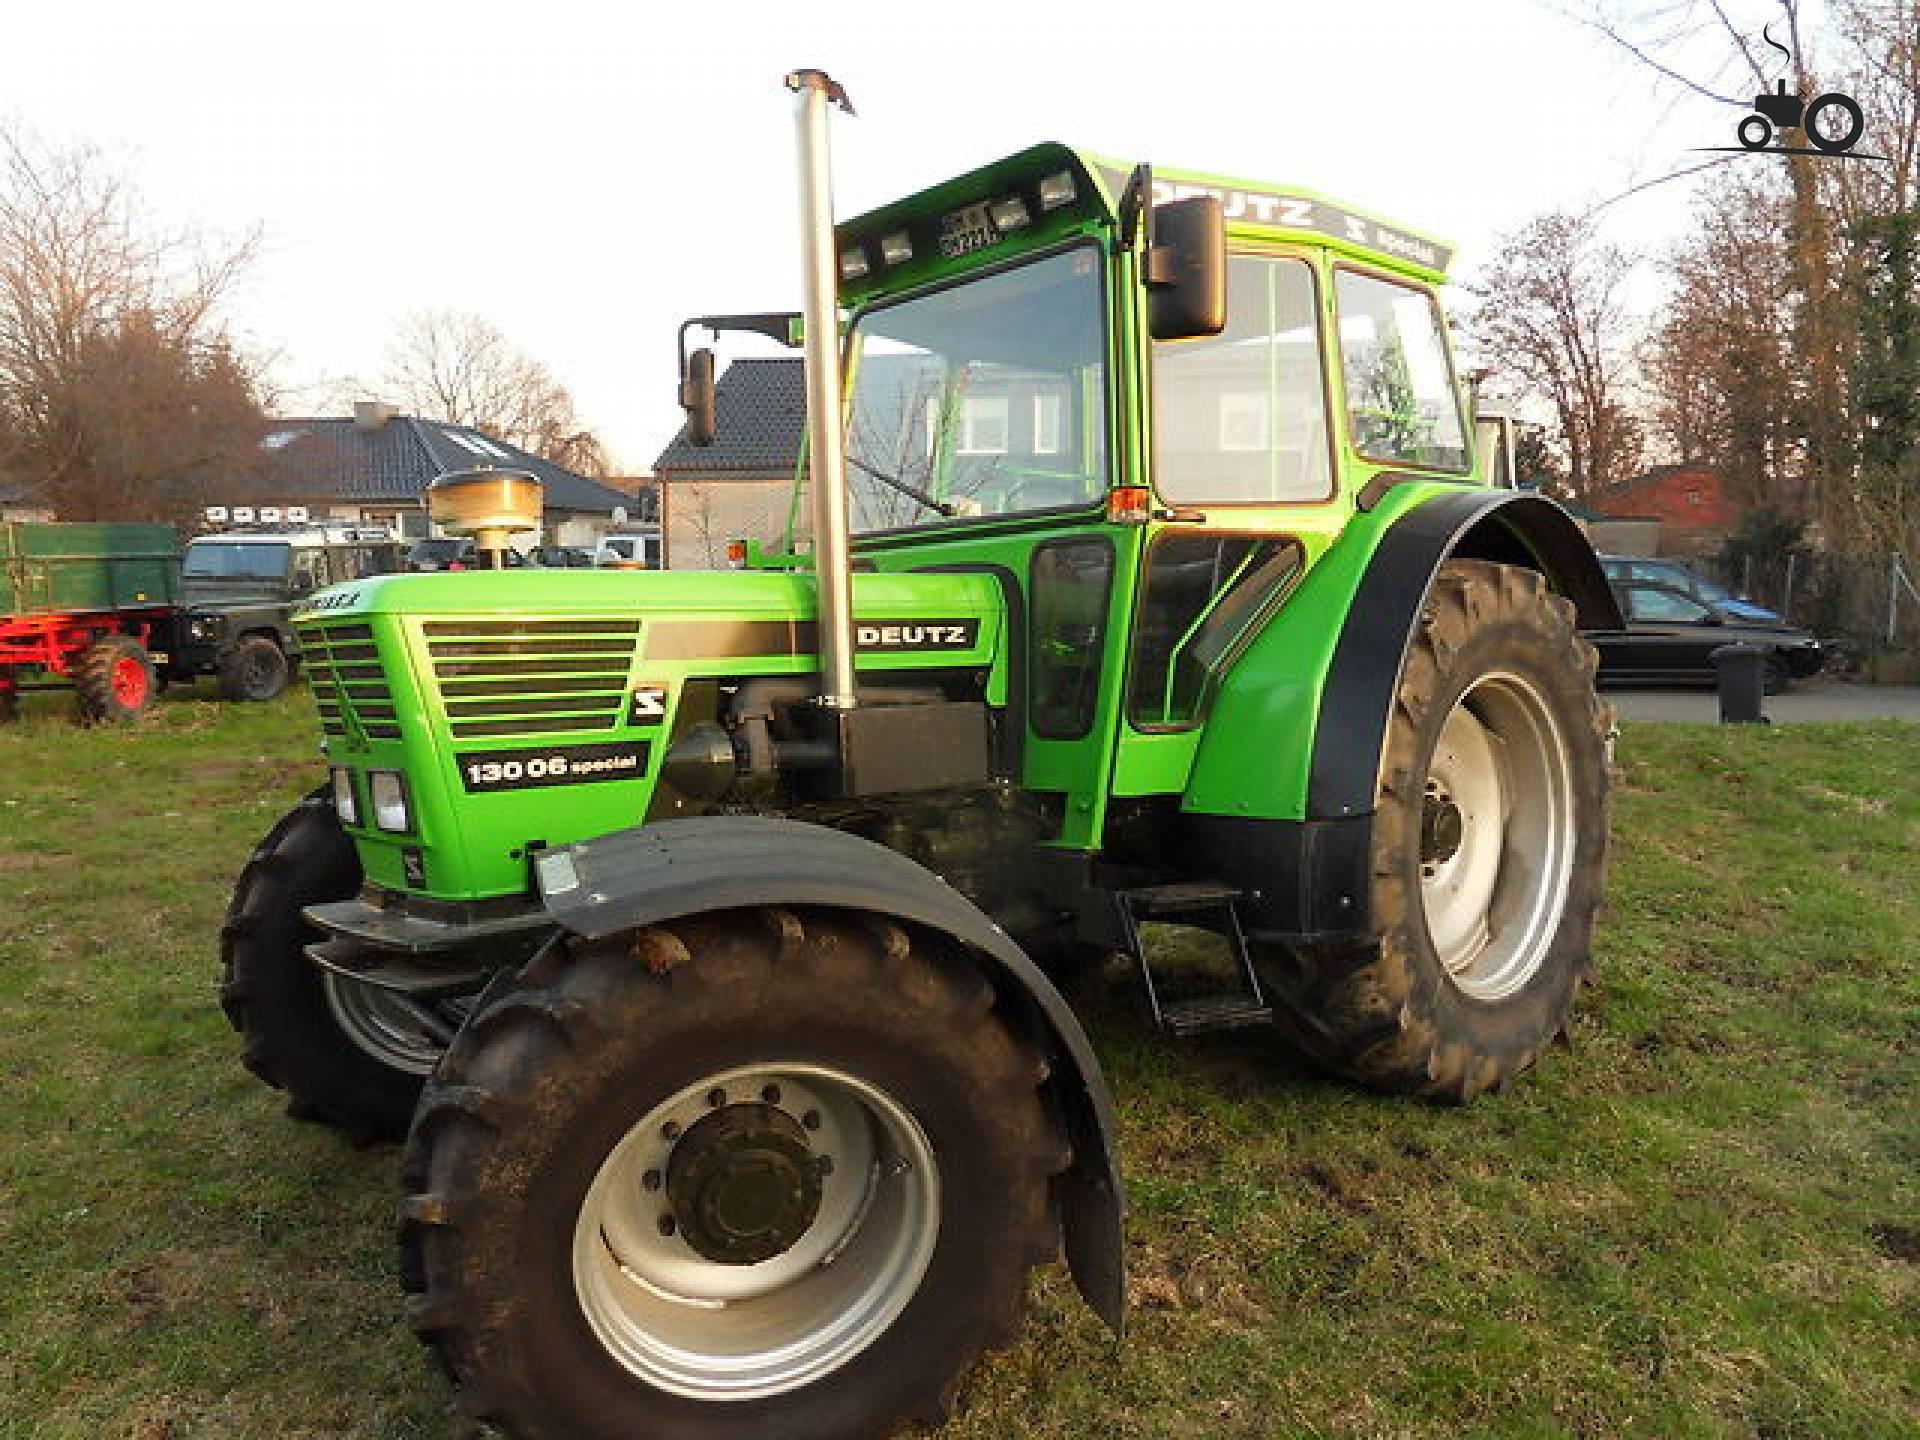 Walts Tractor Parts : Deutz tractor parts manuals